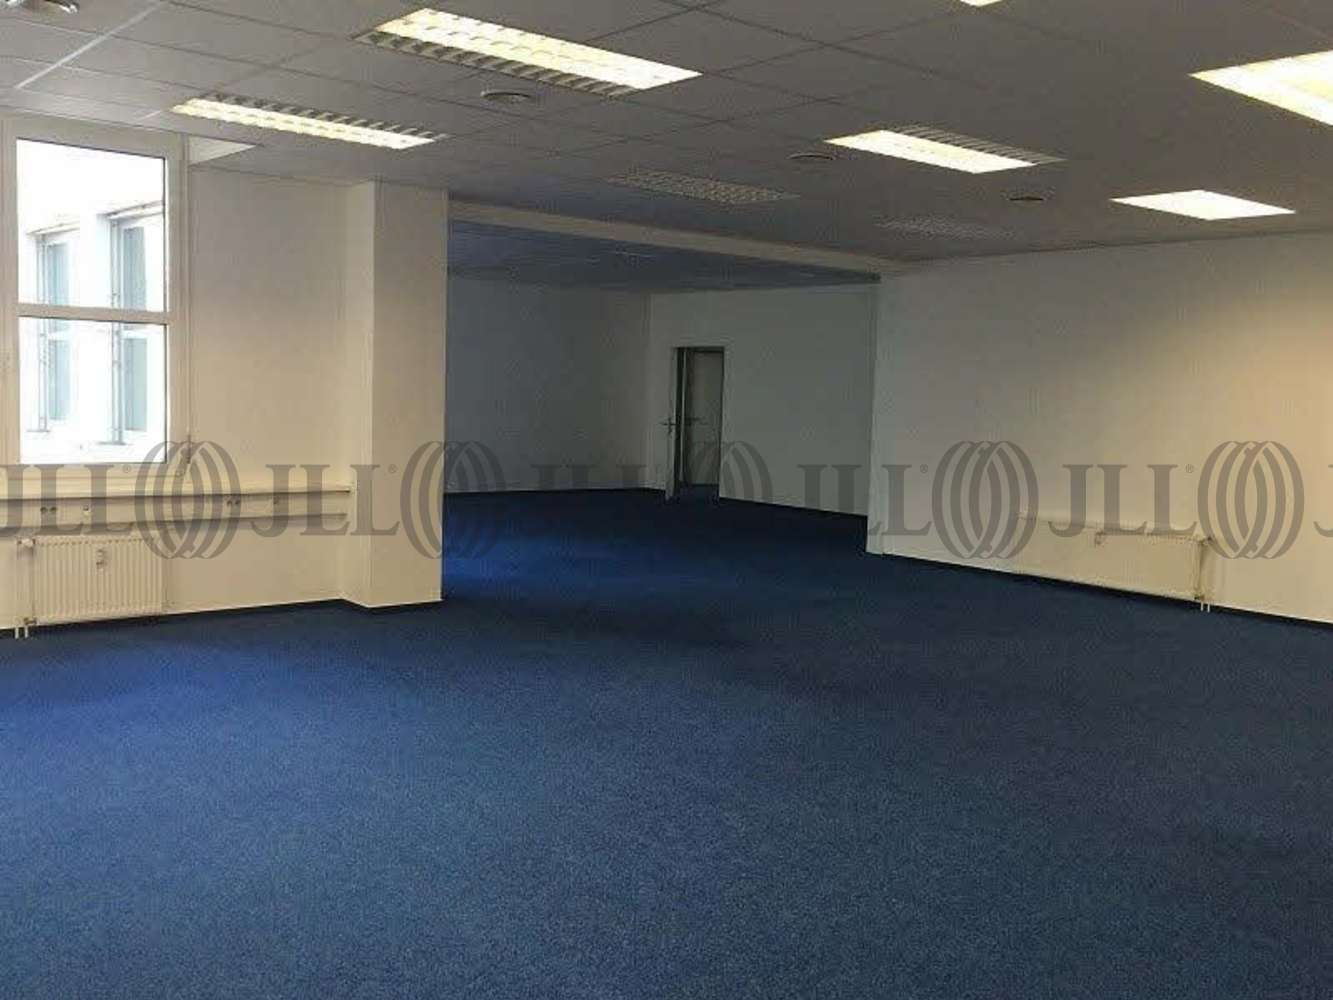 Büros Frankfurt am main, 60437 - Büro - Frankfurt am Main, Nieder-Eschbach - F0056 - 9480536